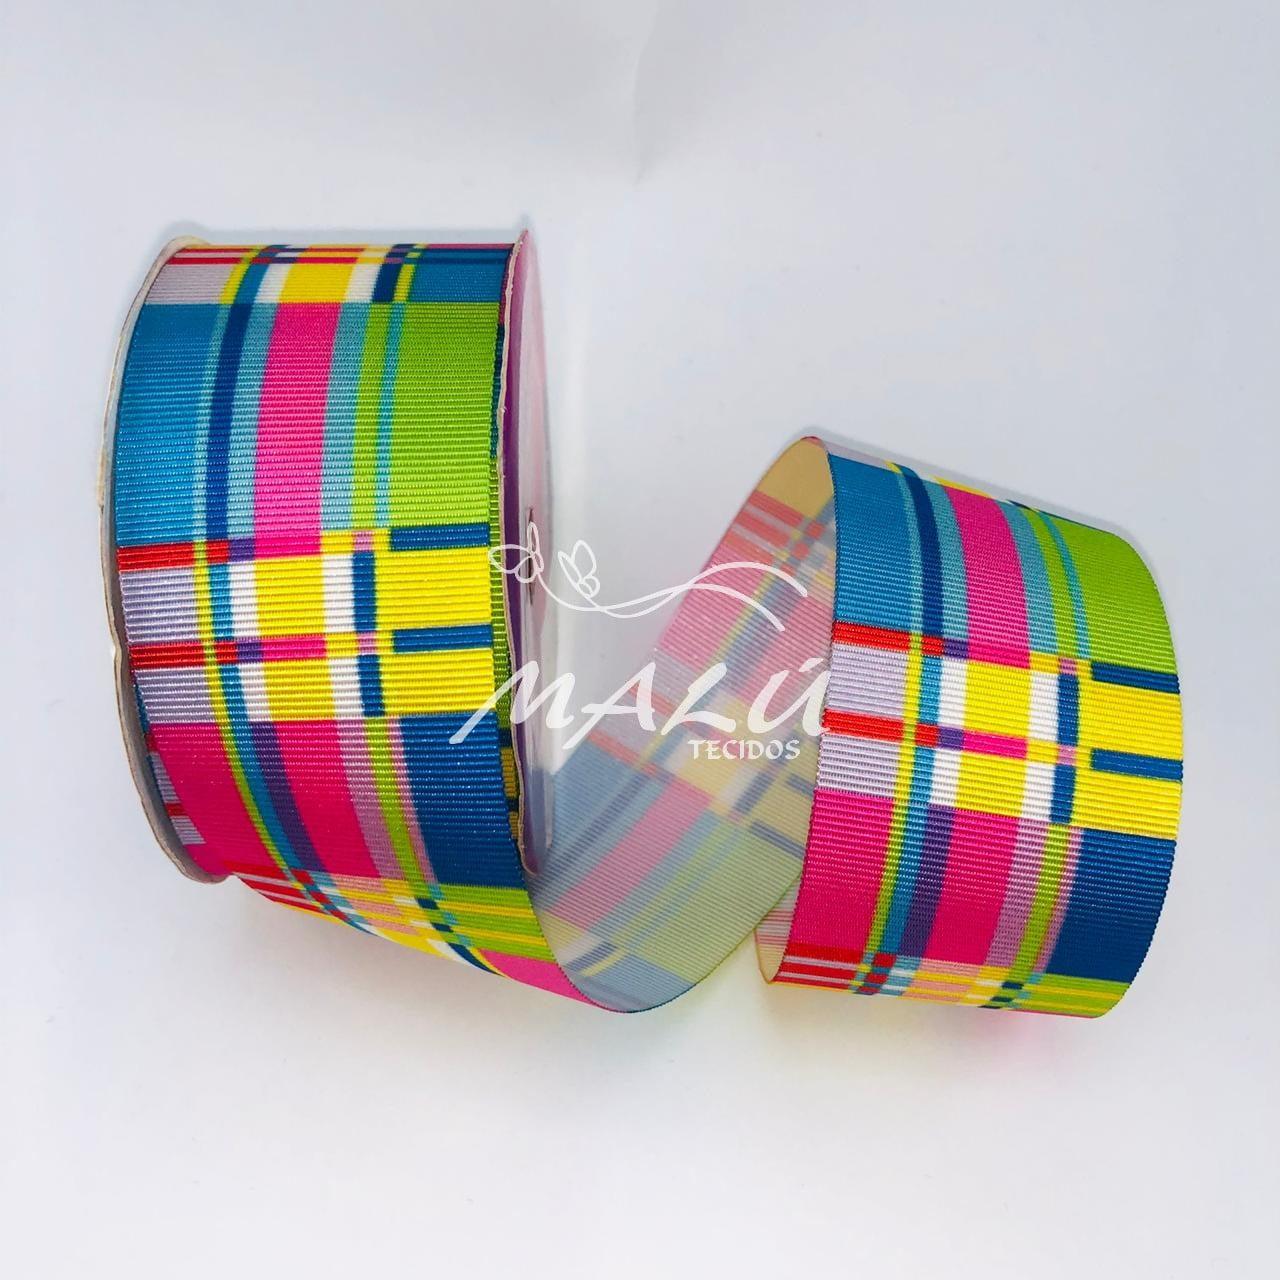 Fita Gorgurão Estampada Colorida N9 10mts